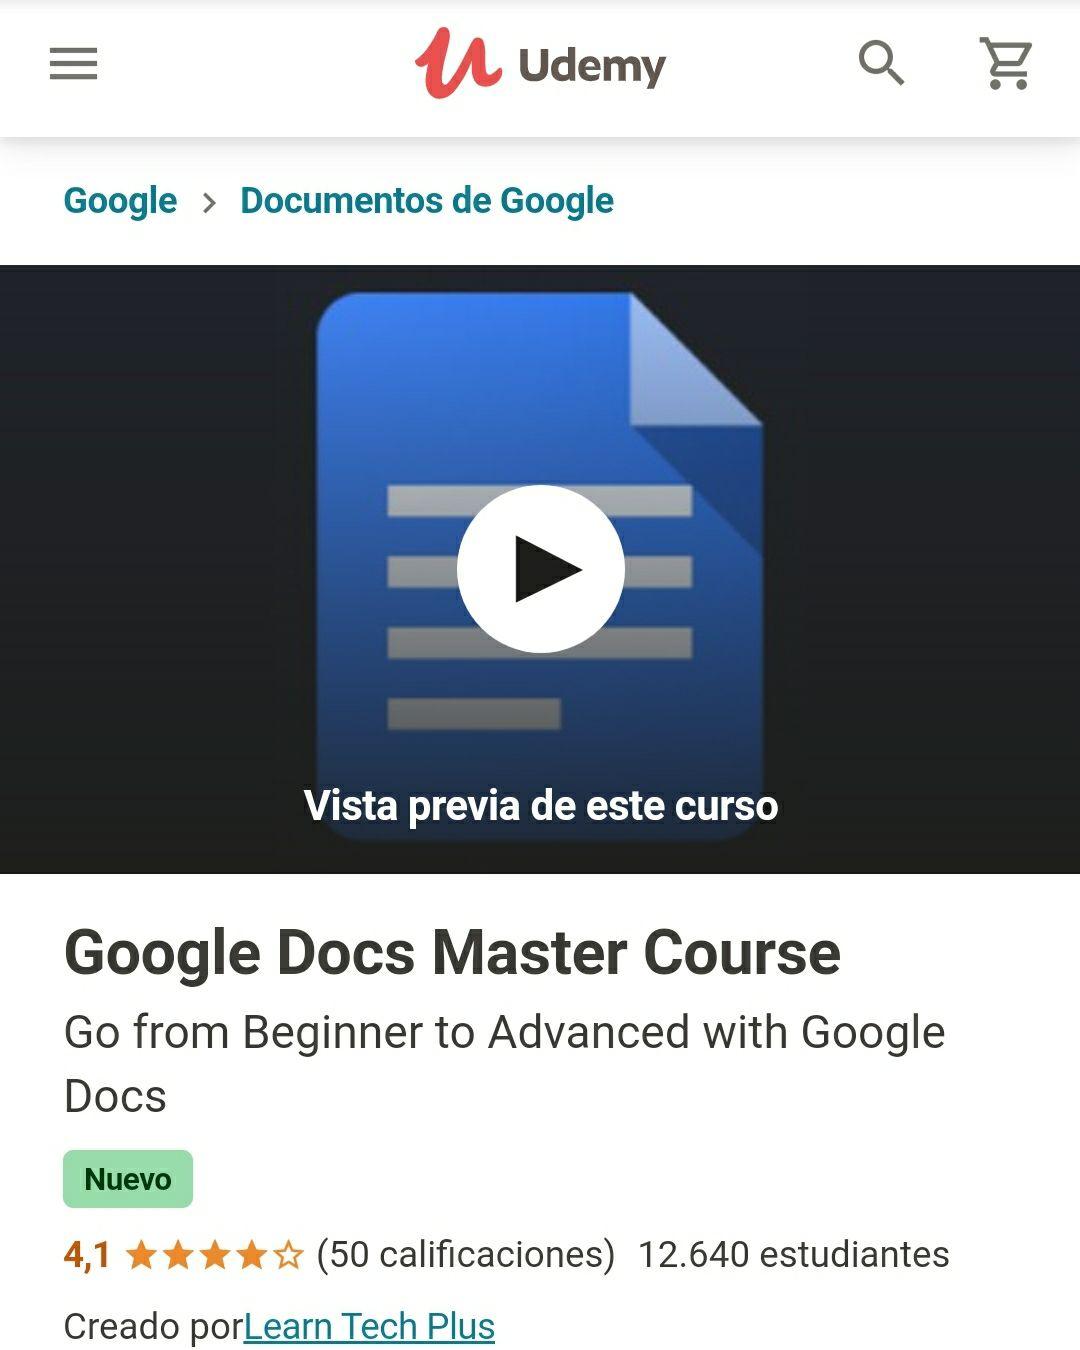 Udemy: Google Docs Master Course